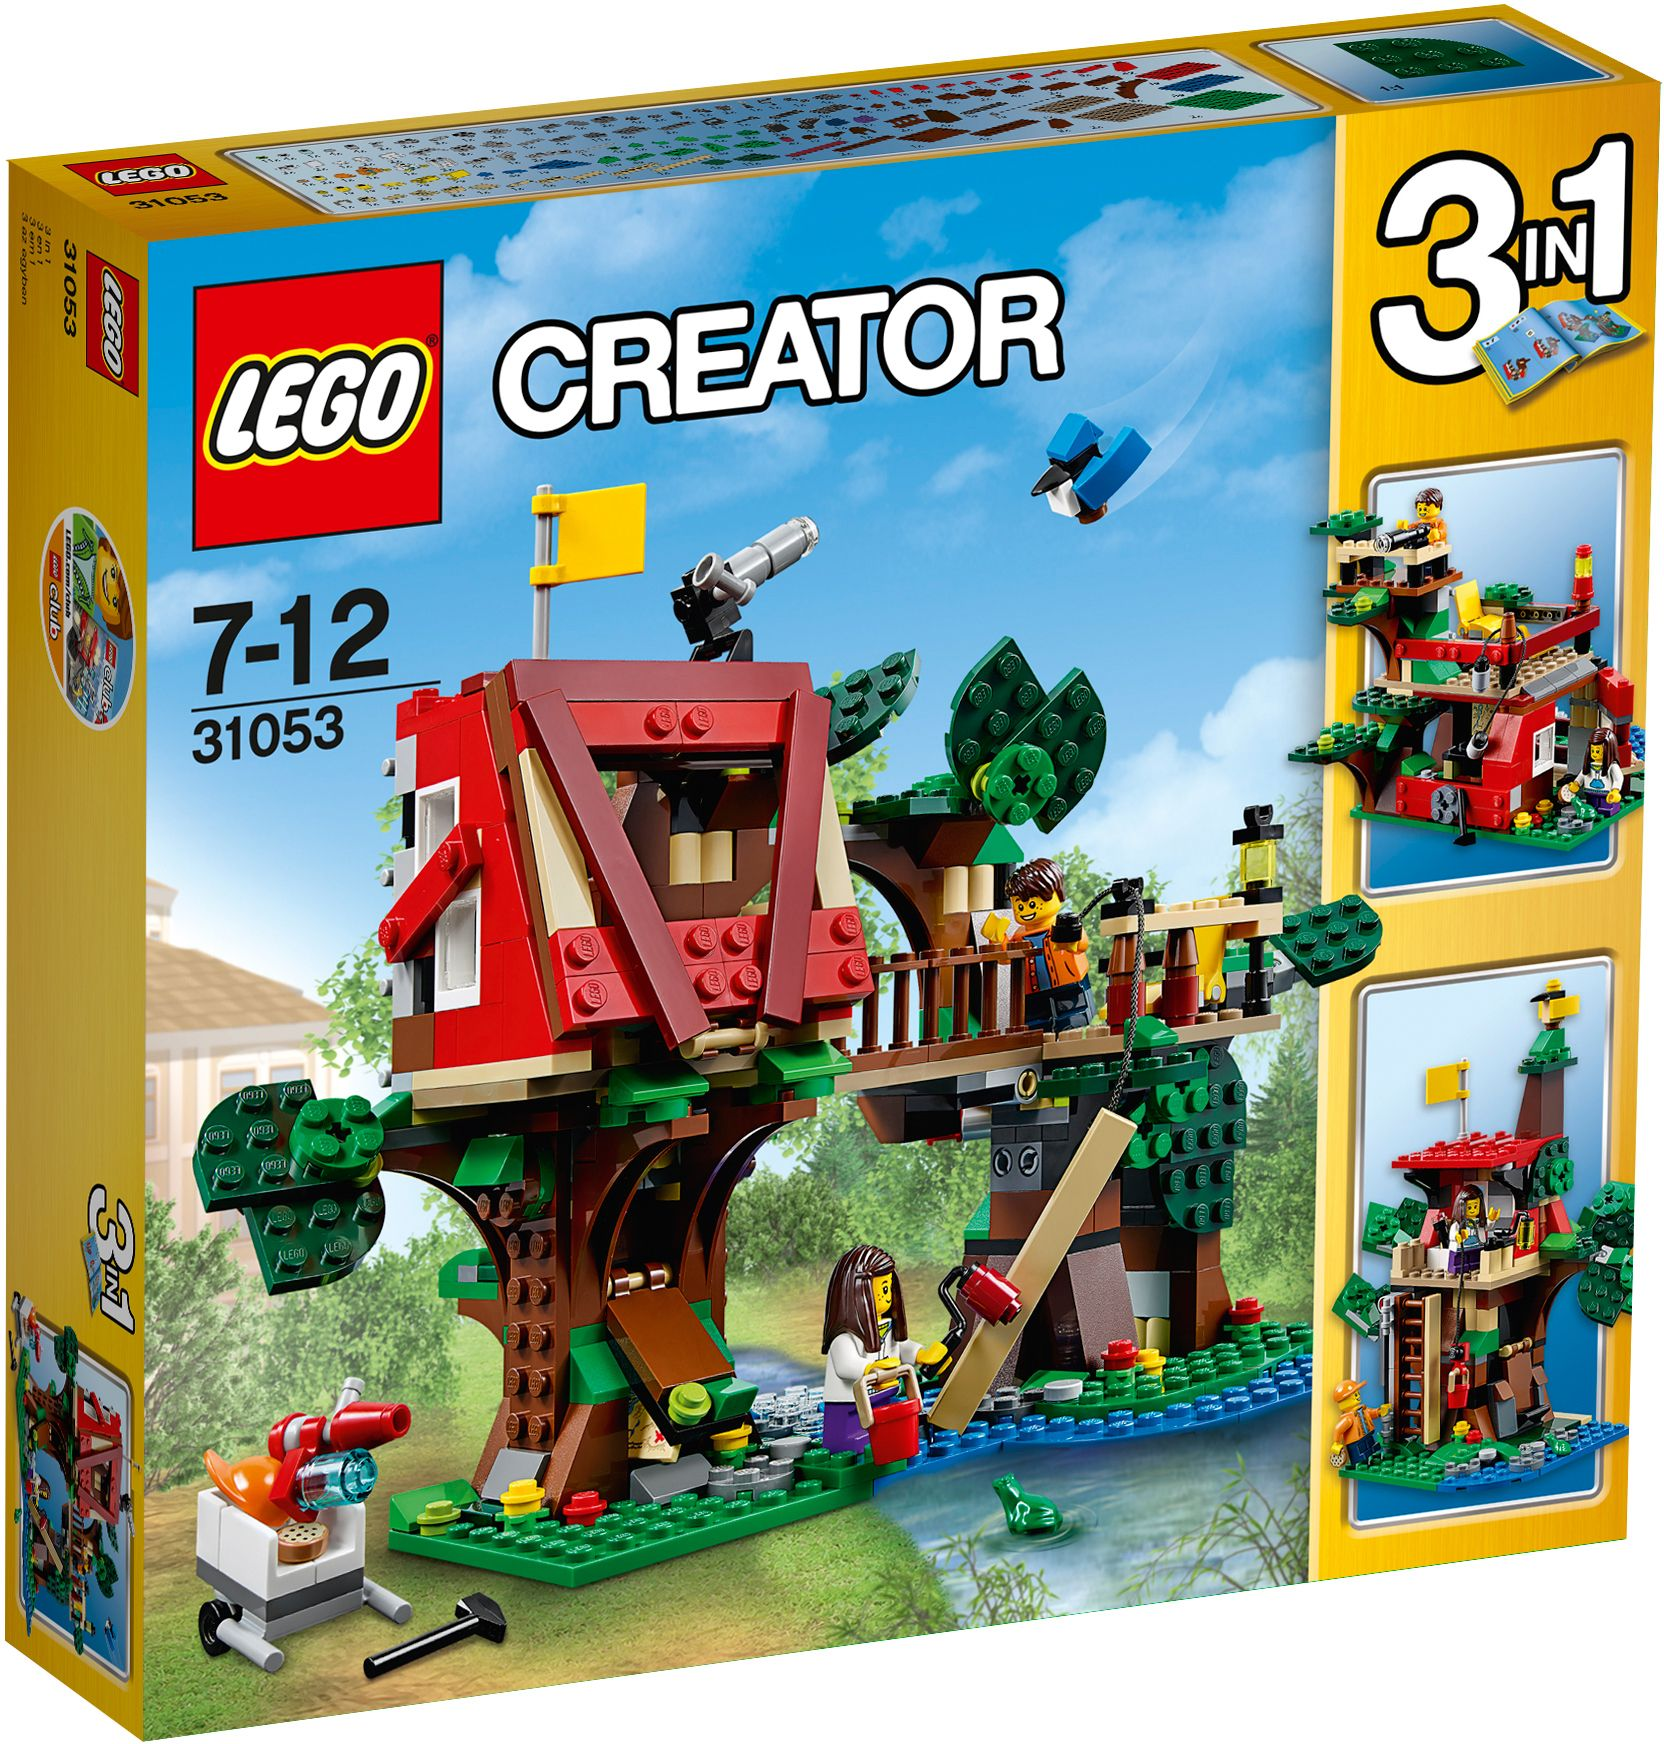 LEGO® 31053 Creator Baumhausabenteuer, Konstruktionsspielzeug